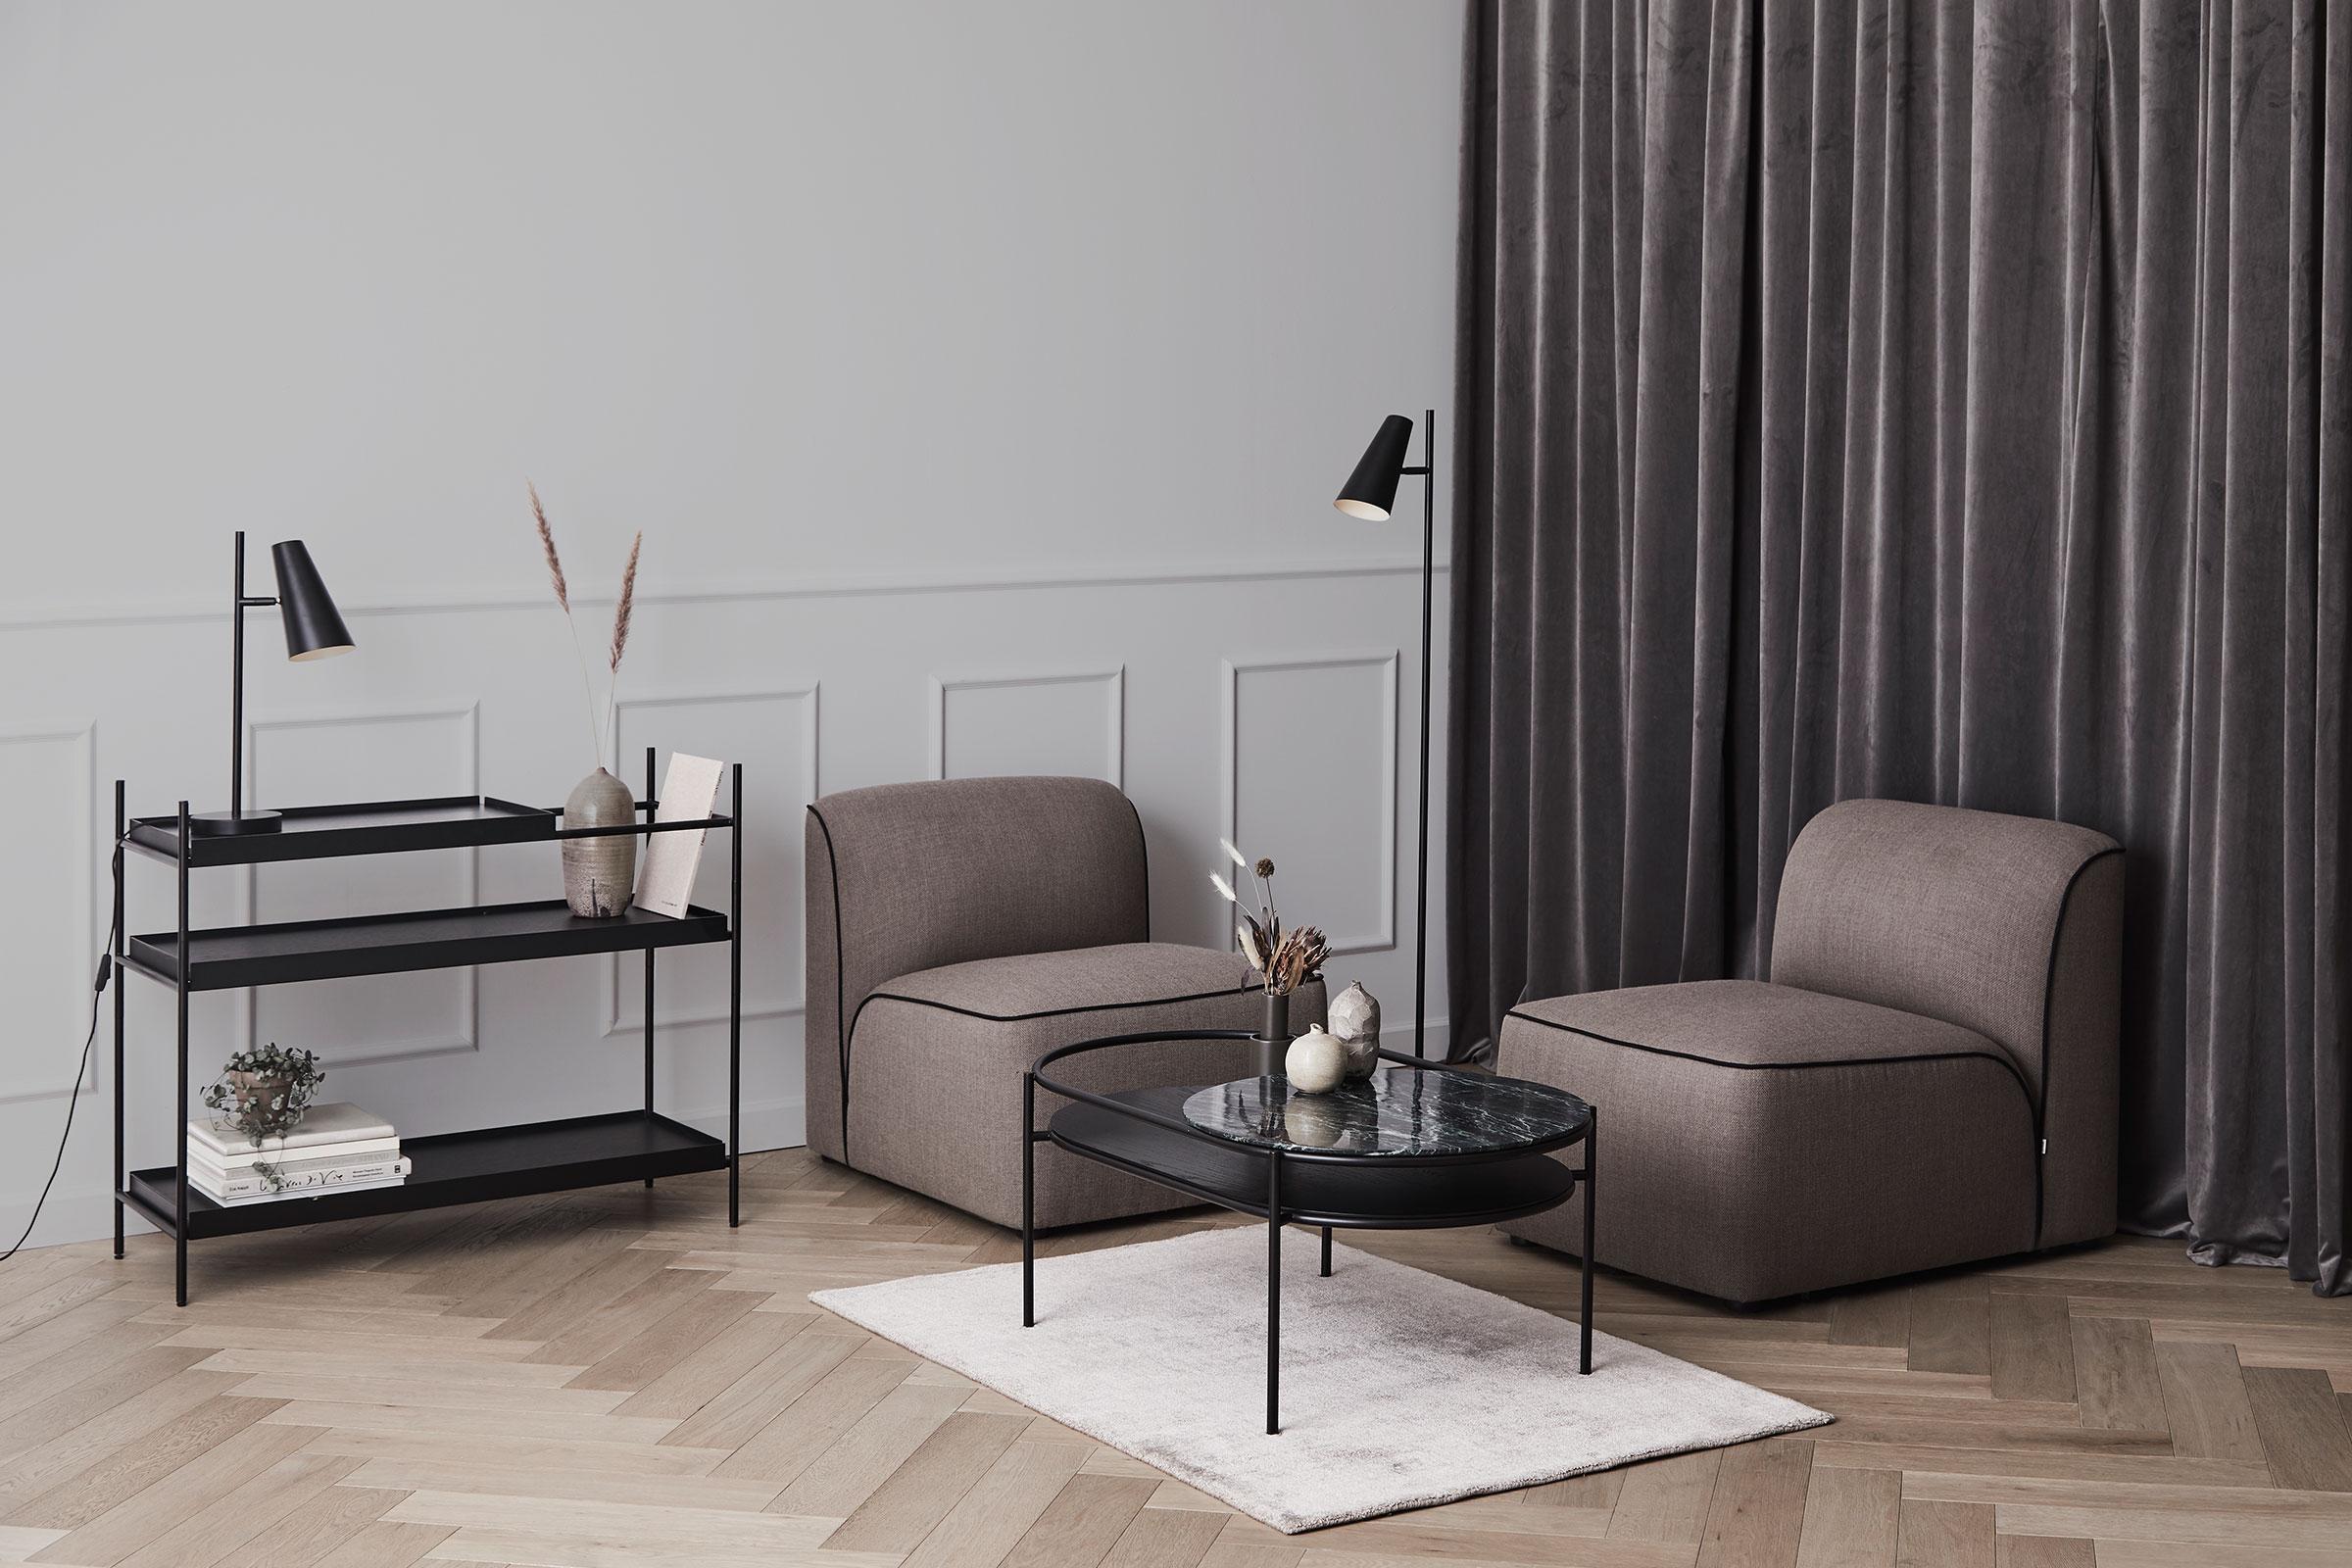 WOUD - Best Furniture and Homewares Brands